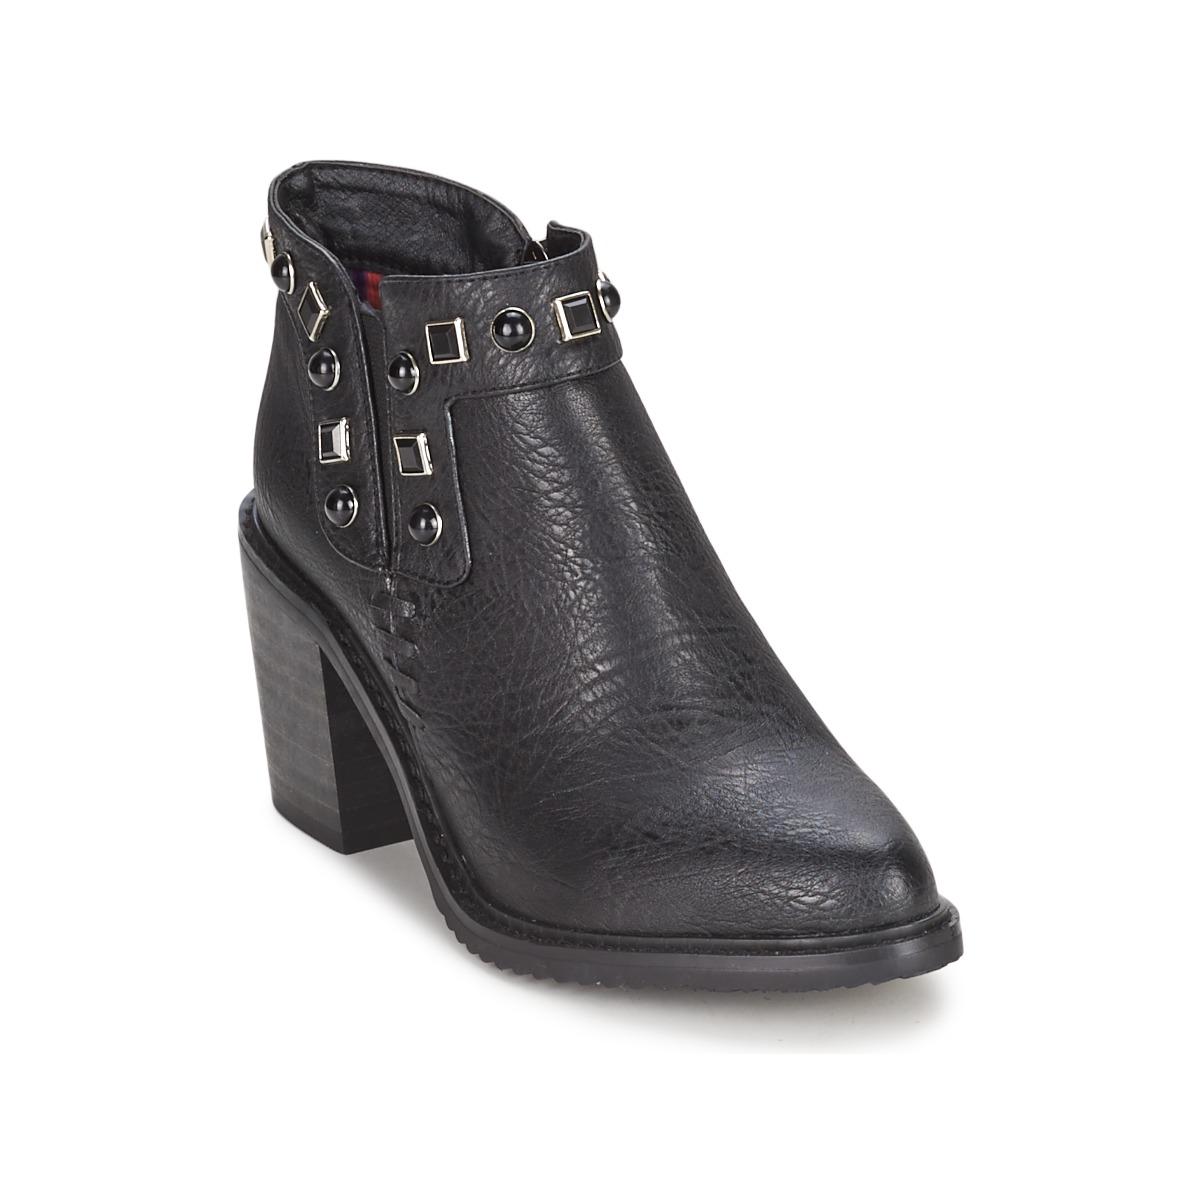 Gioseppo MOSENA Schwarz - Kostenloser Versand bei Spartoode ! - Schuhe Low Boots Damen 28,00 €